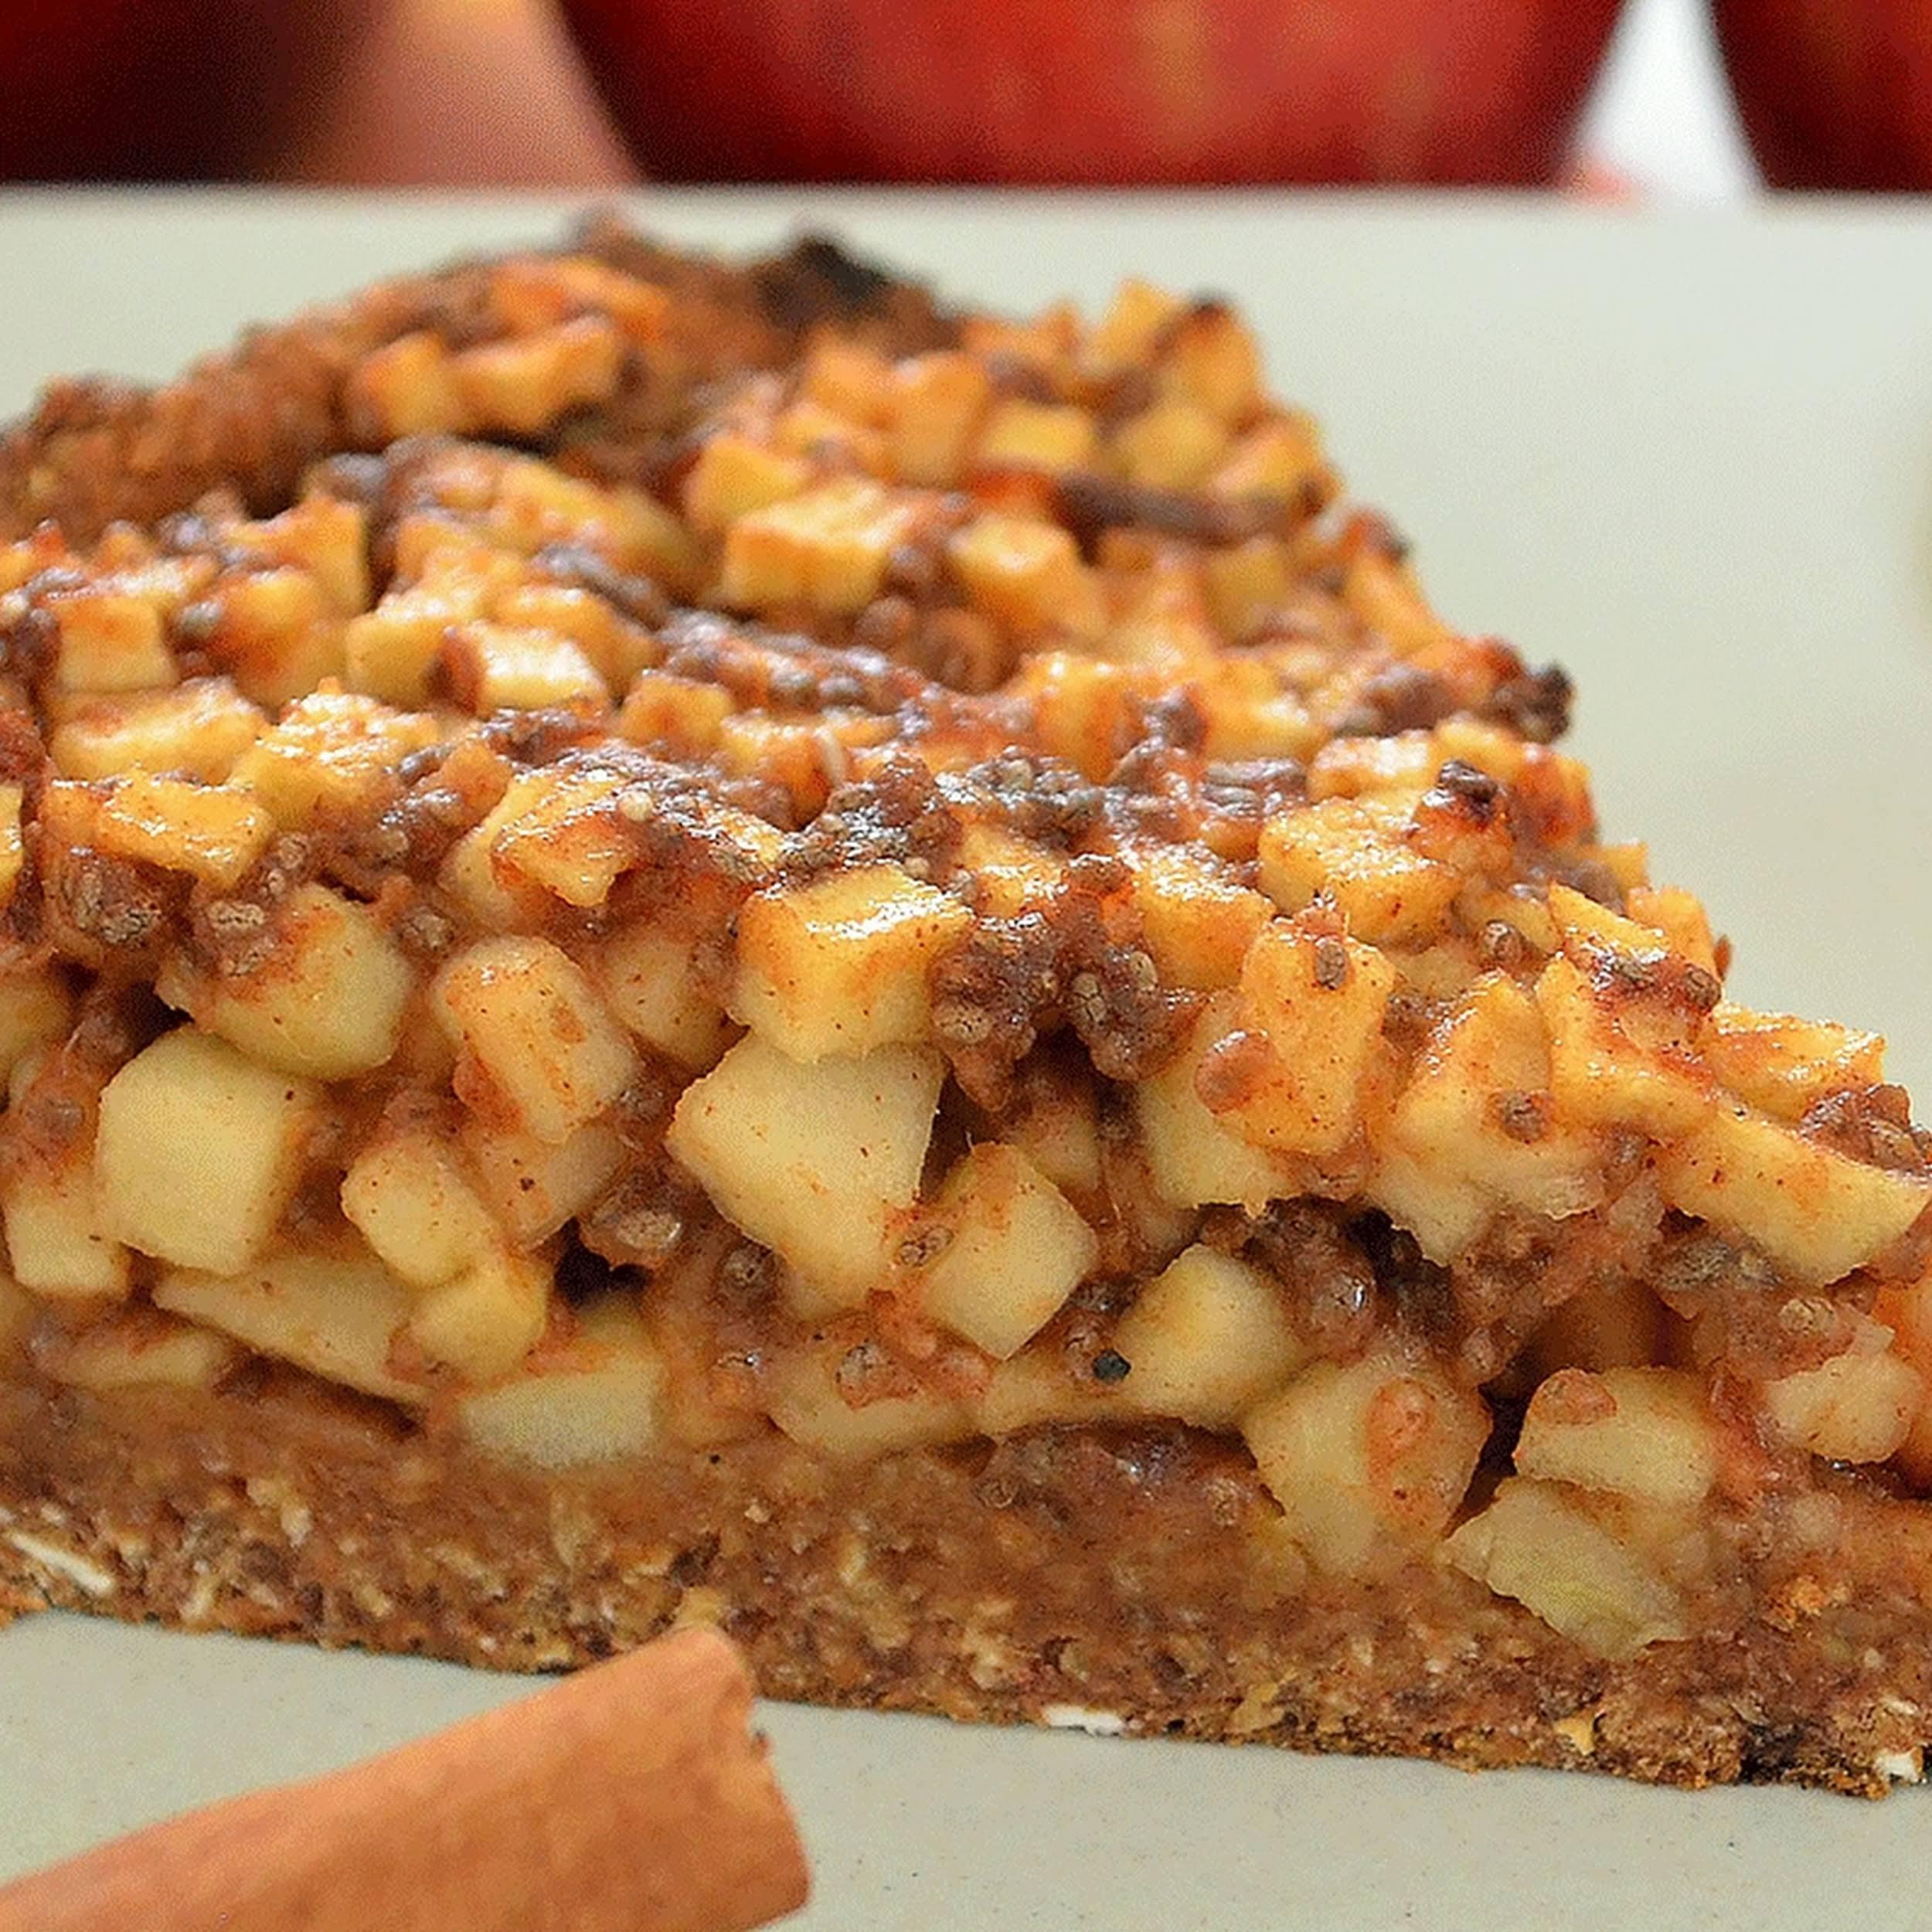 The World's Healthiest Apple Pie